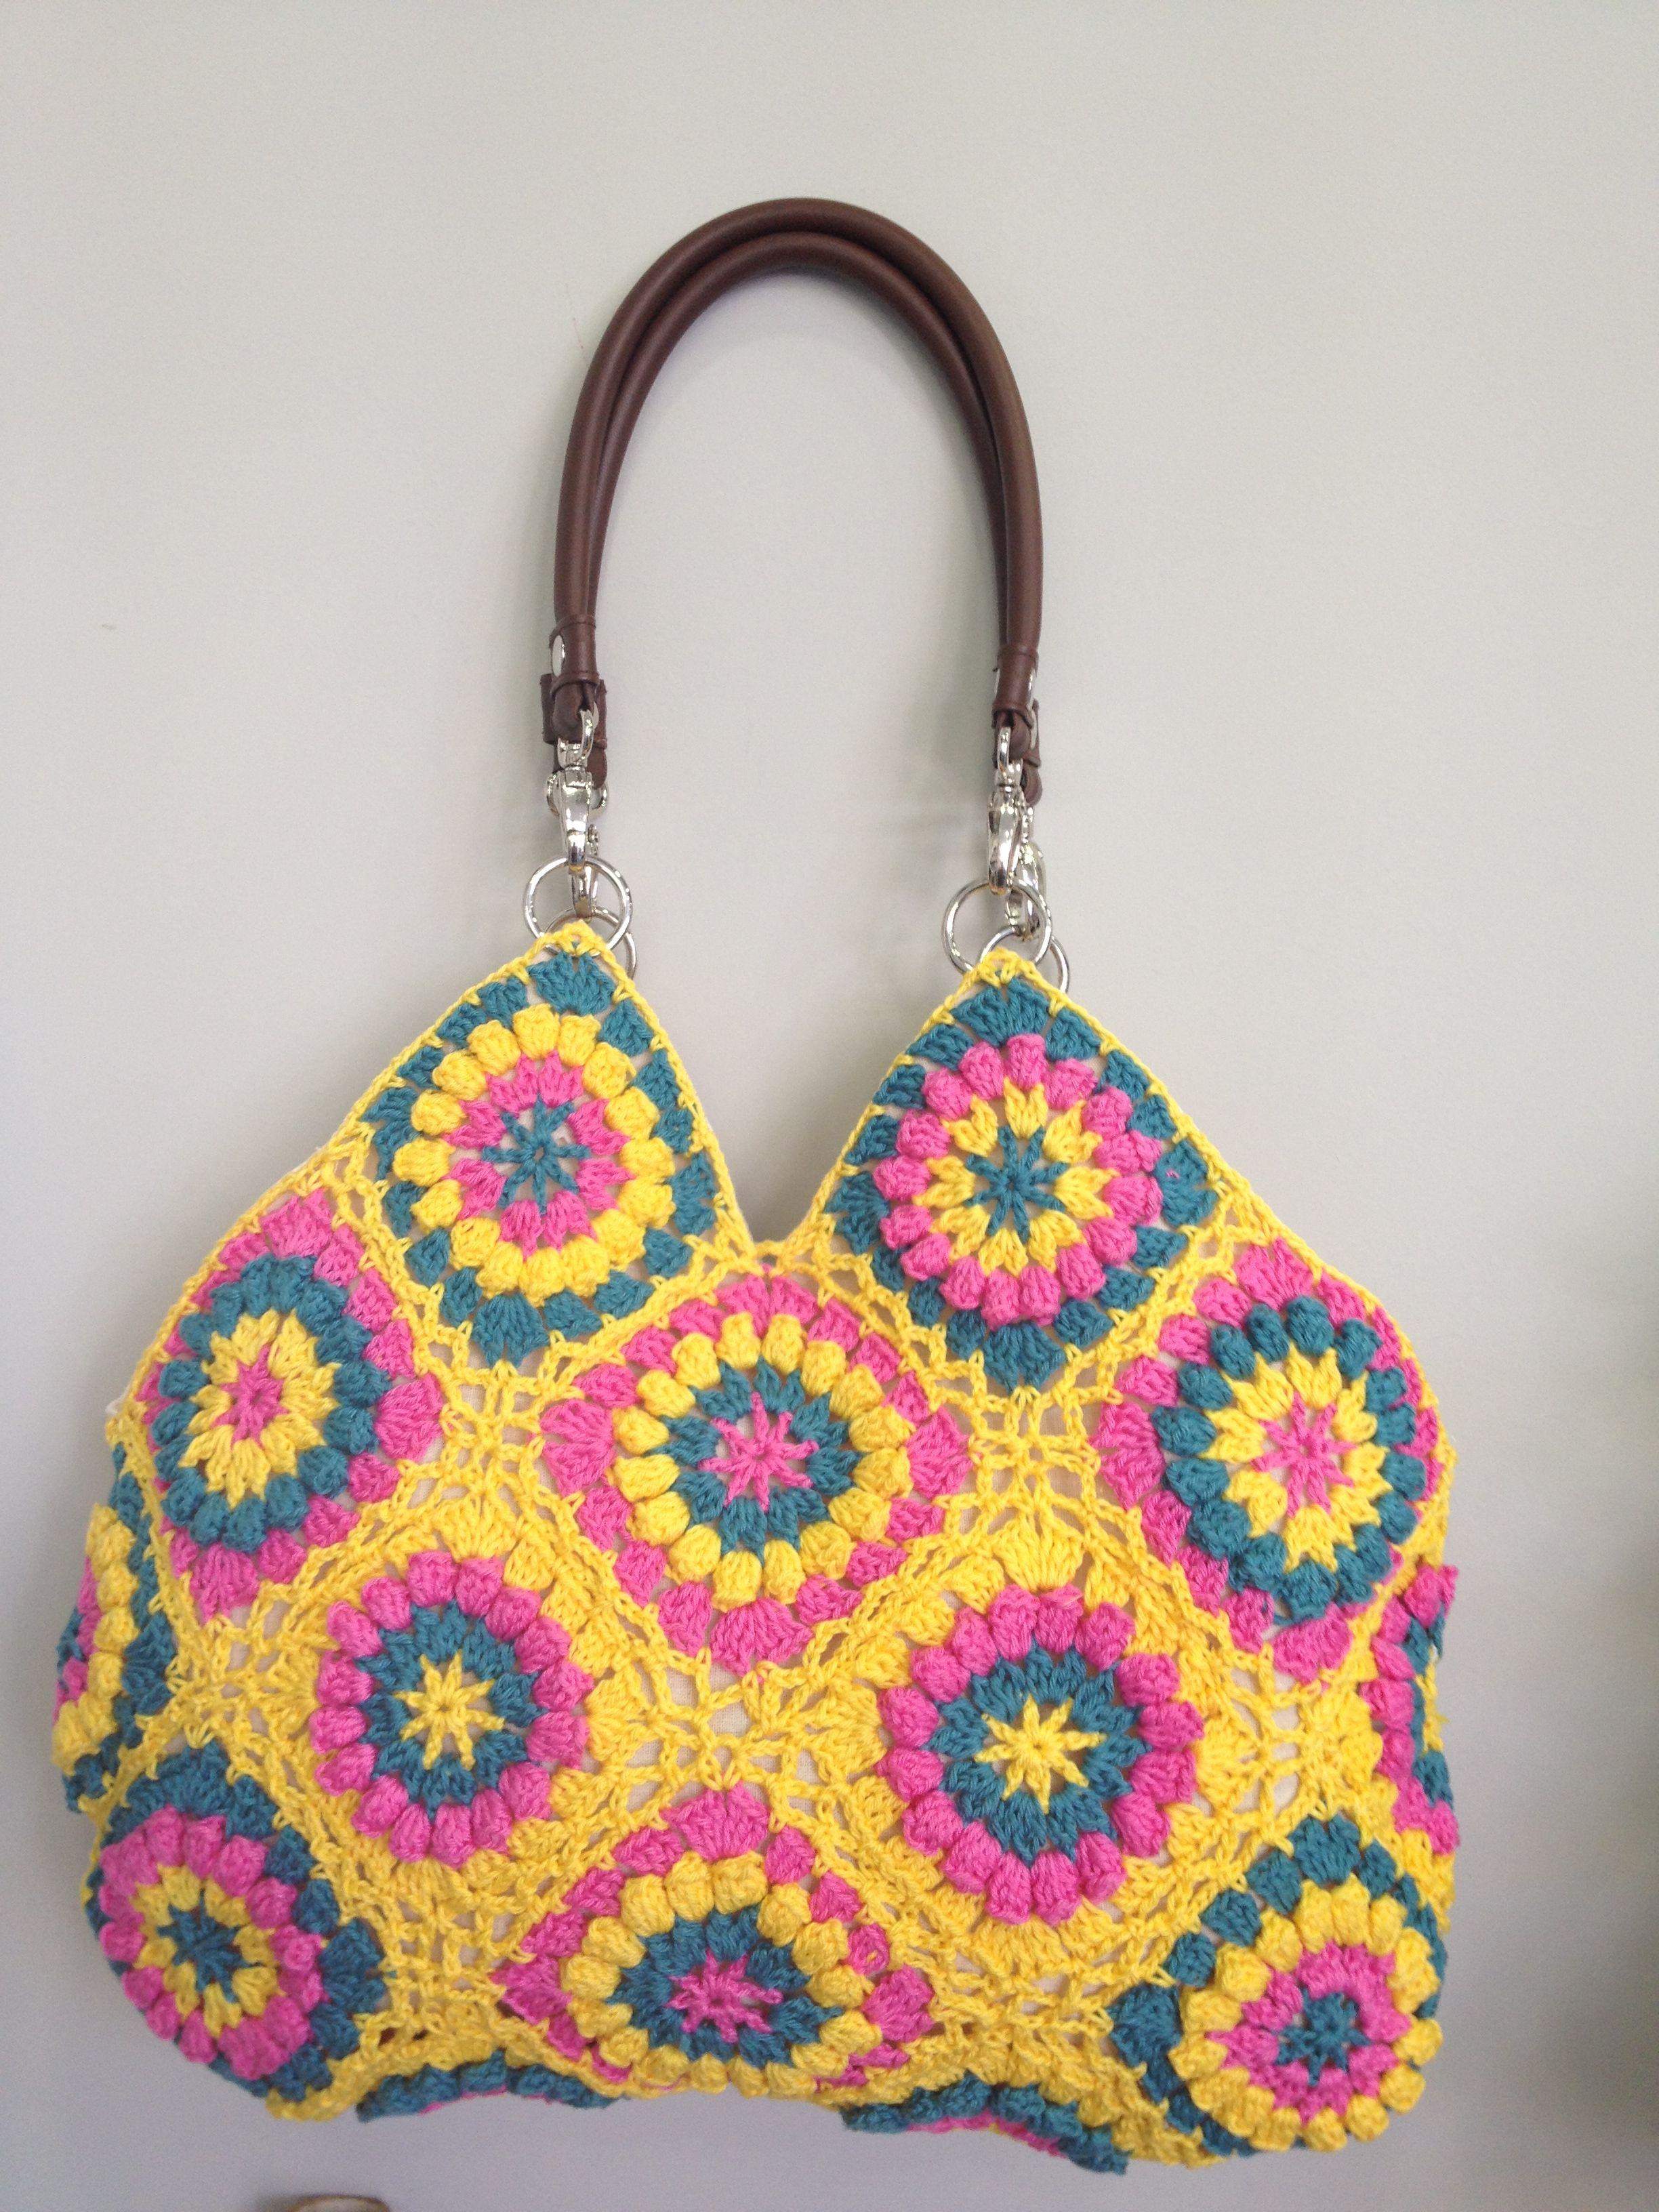 Summer Cotton Bag with Granny Squares ♛ Anastasia Gr